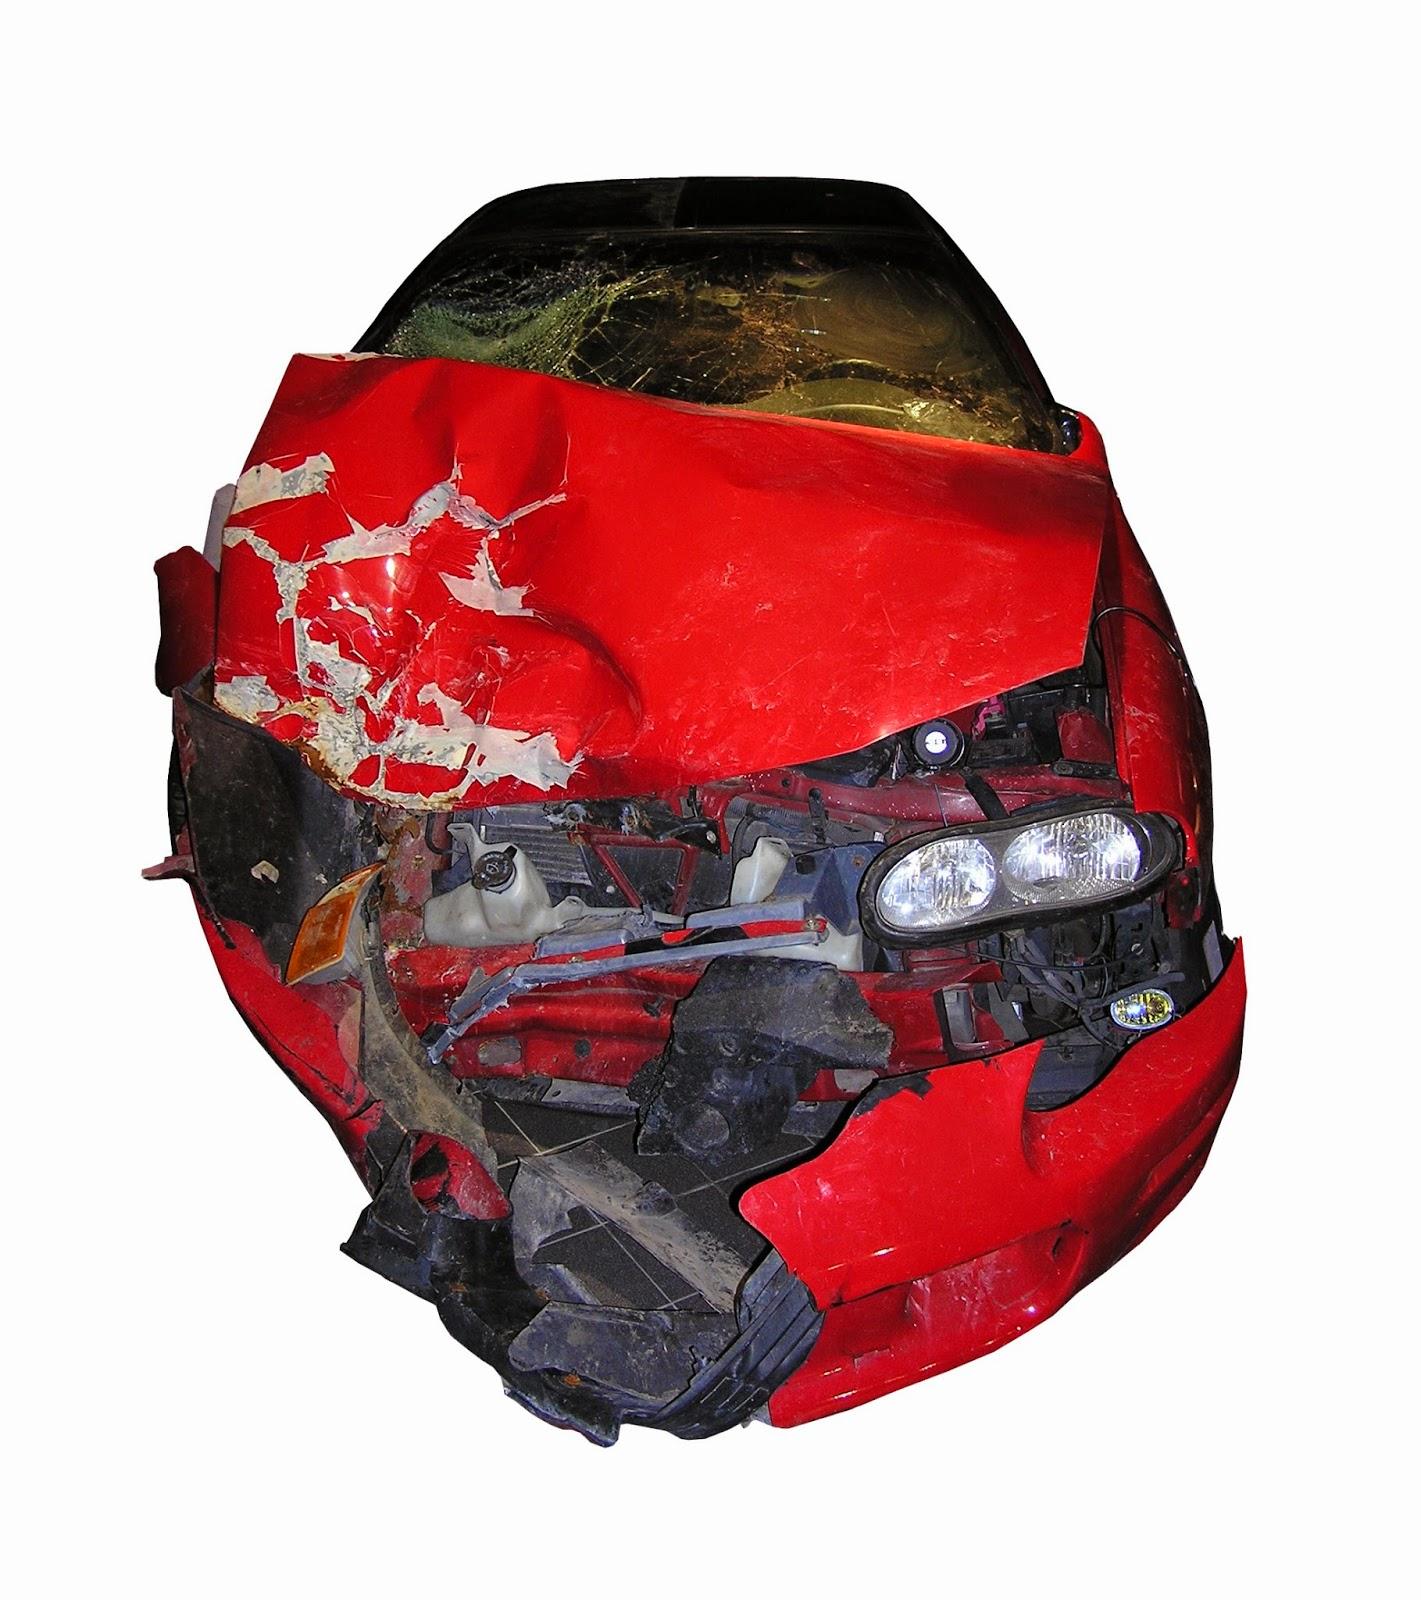 wrecked+car.jpg